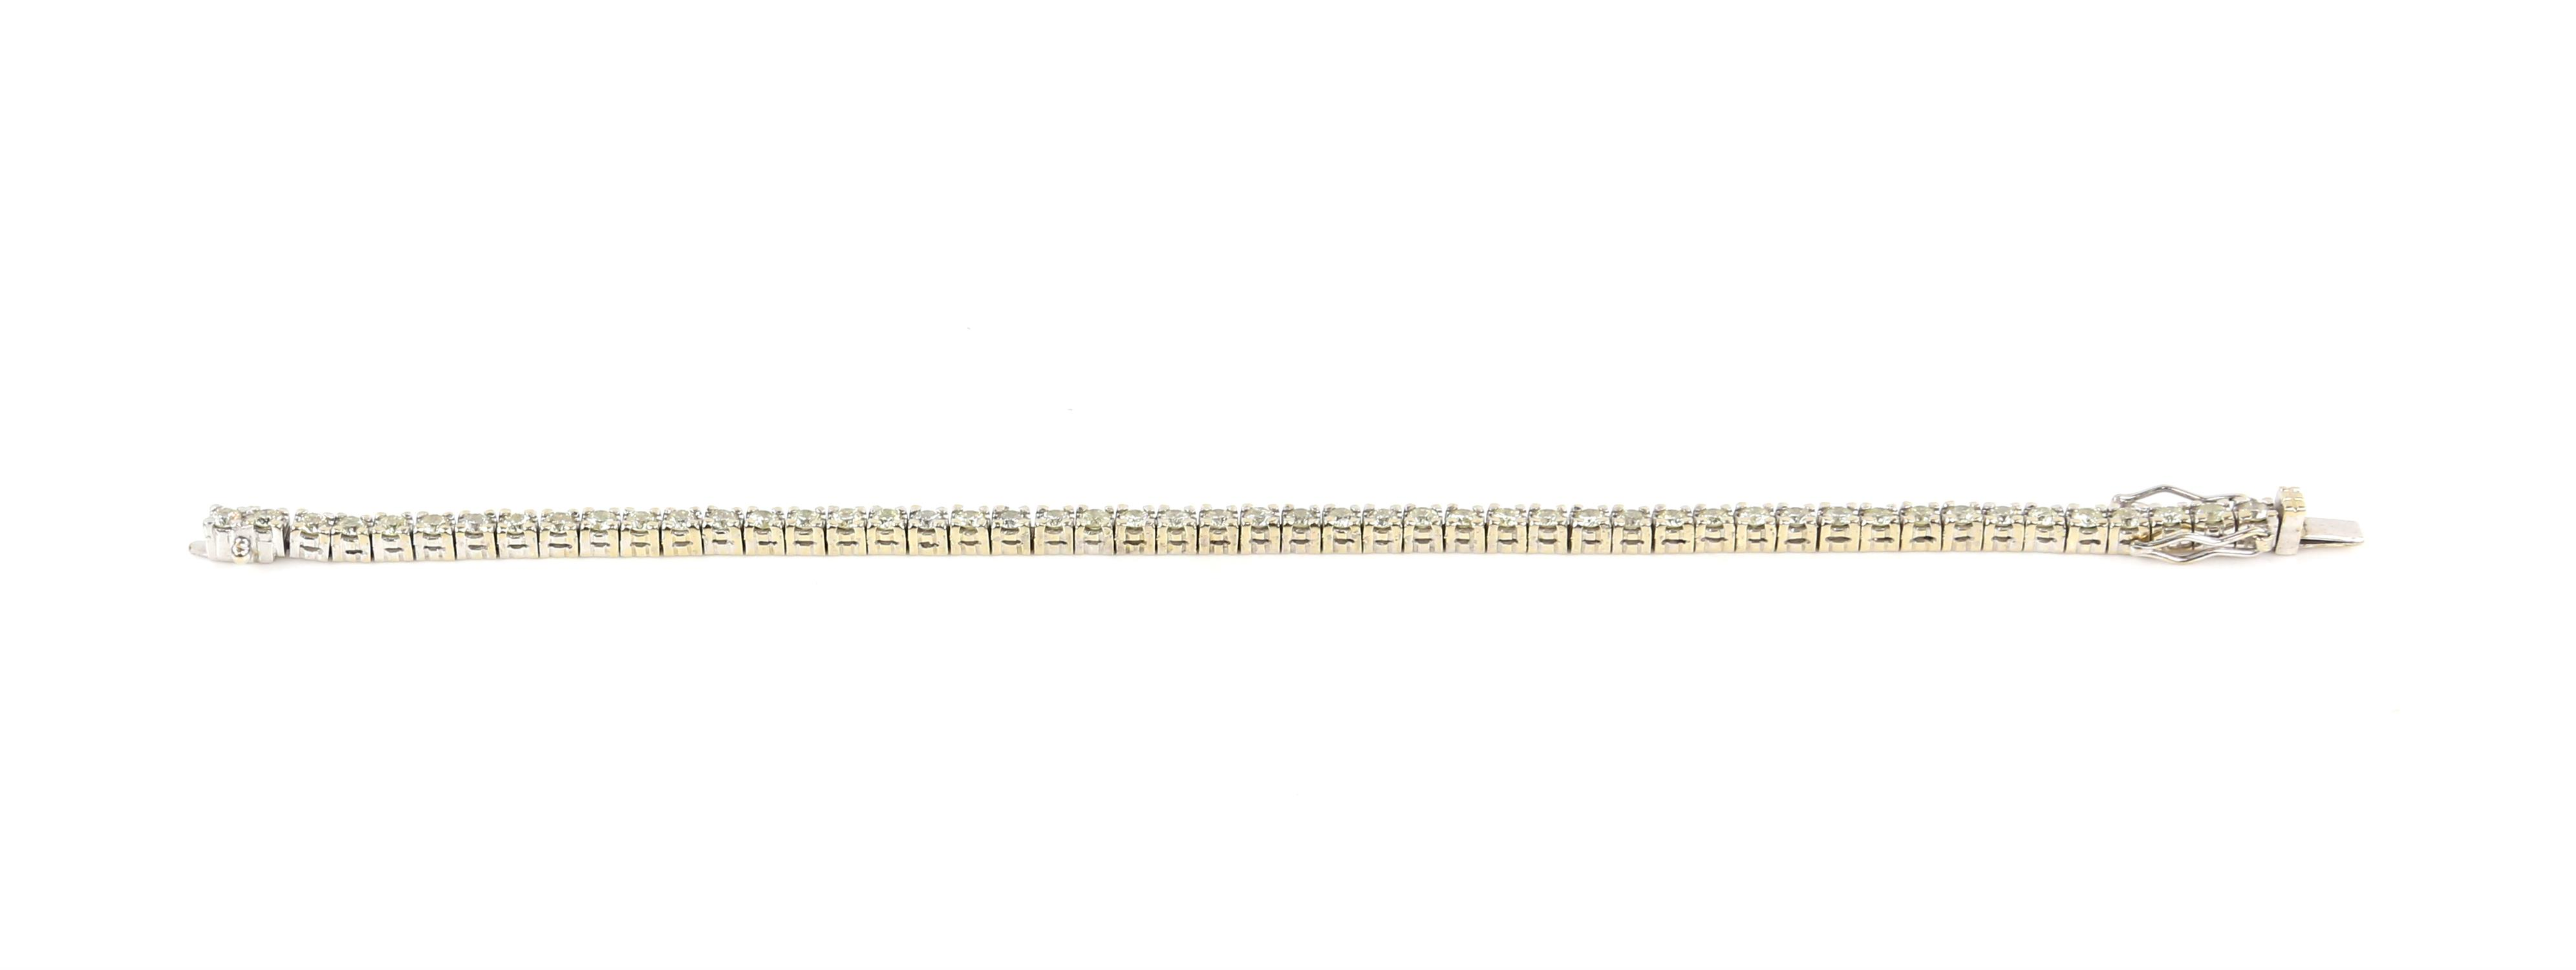 Diamond line bracelet, set with round brilliant cut diamonds, estimated total diamond weight 3. - Image 2 of 6